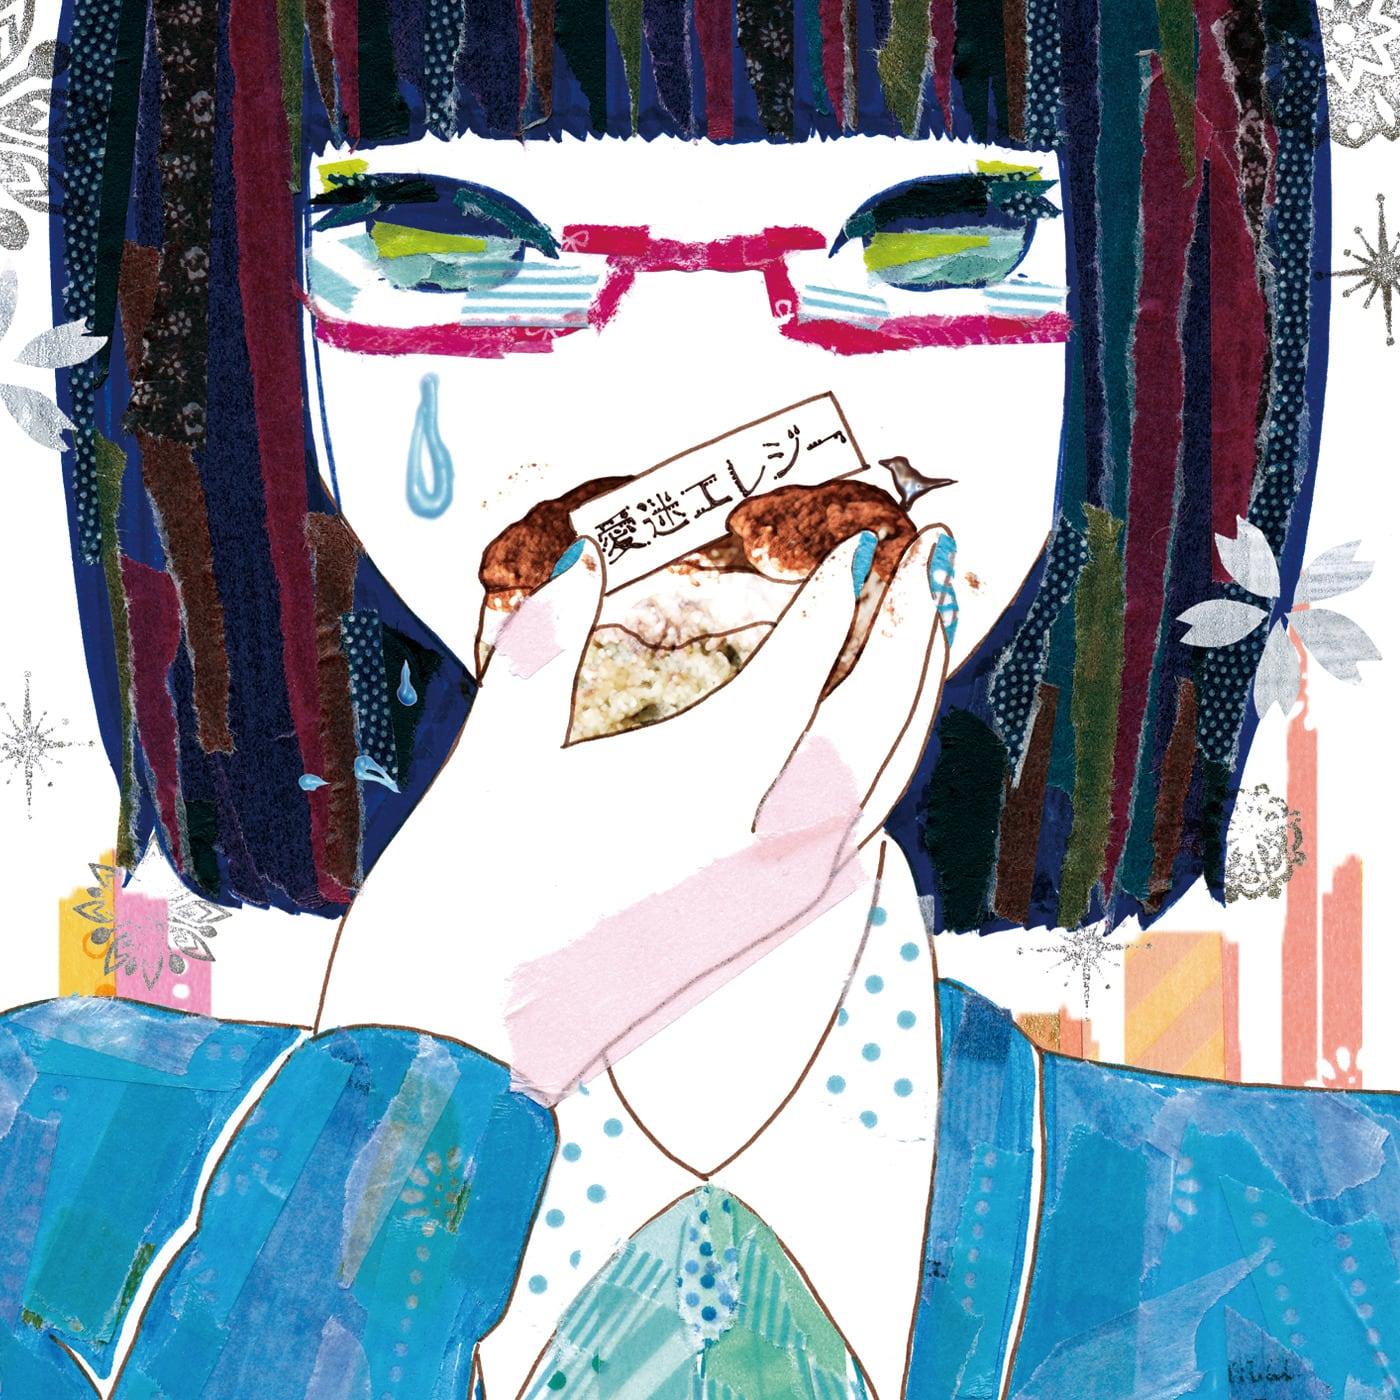 DECO*27 / 愛迷エレジー - 画像1